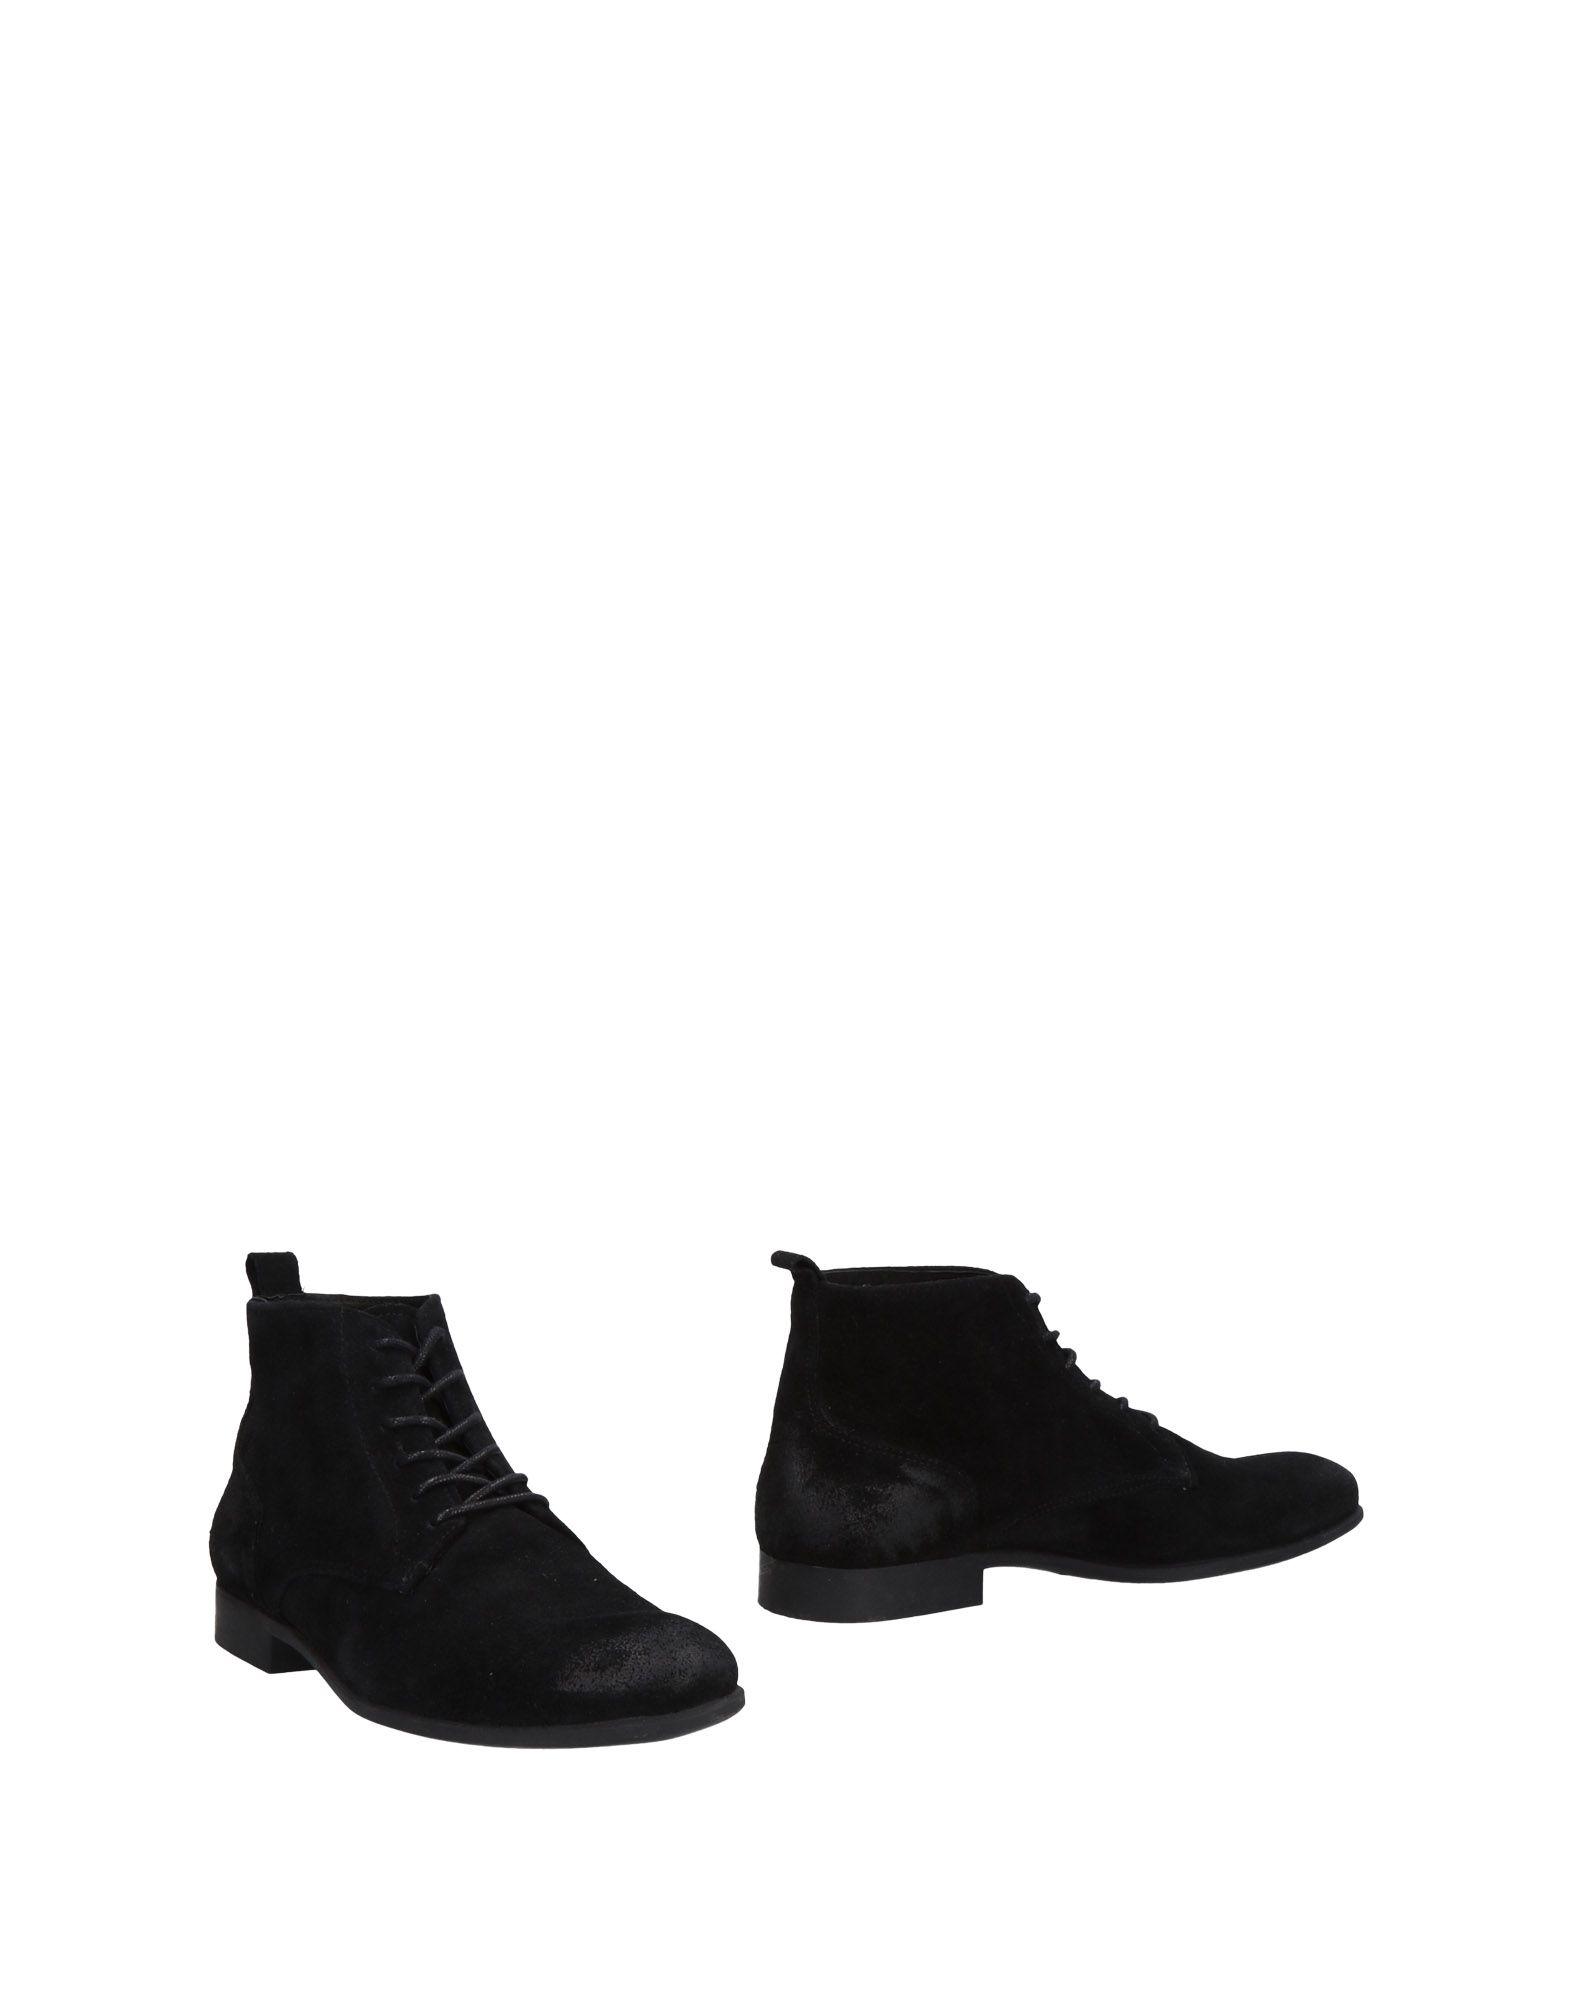 Haltbare Mode billige Schuhe Selected Stiefelette Herren  11468813RL Heiße Schuhe